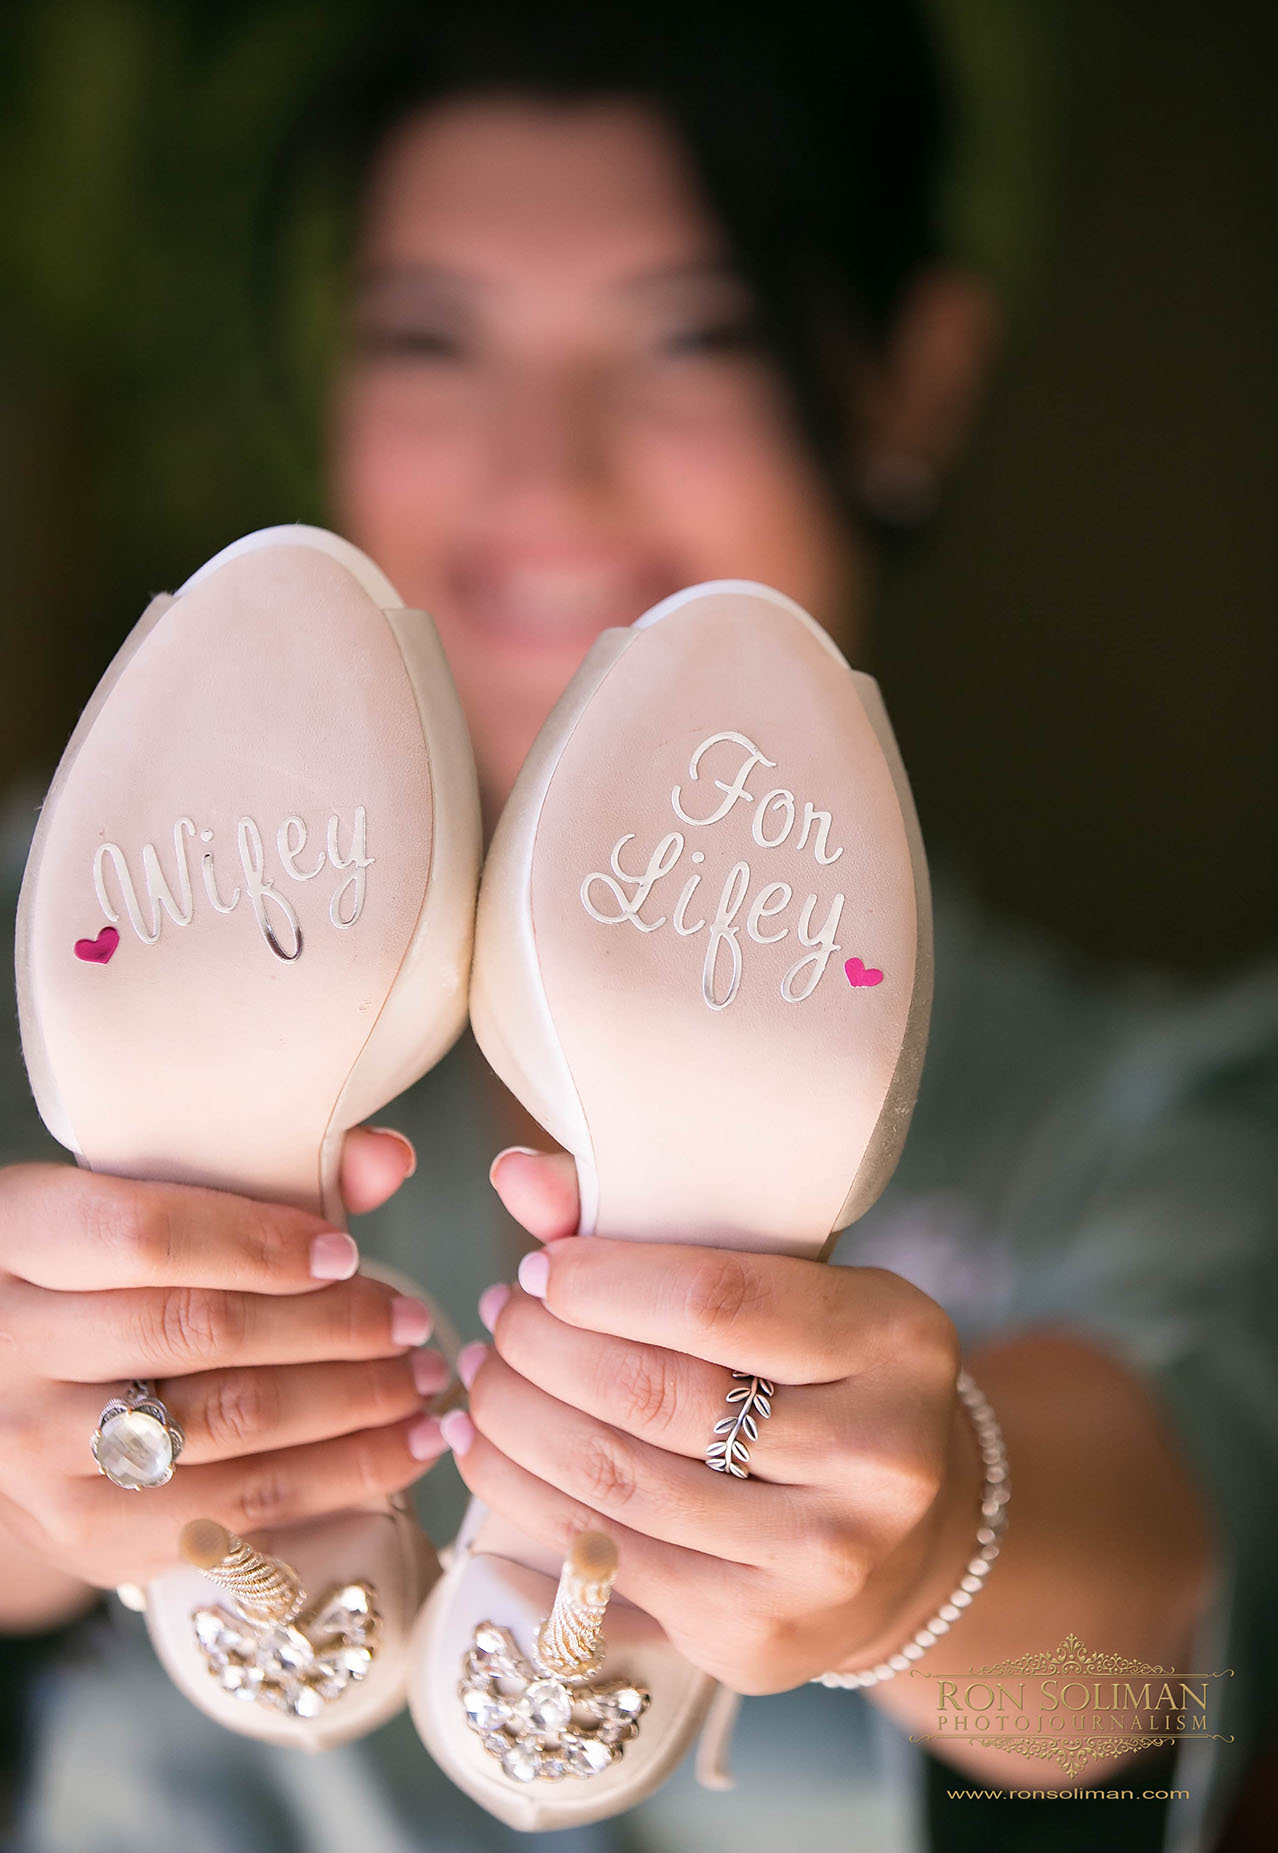 Wifey for Lifey Wedding shoes